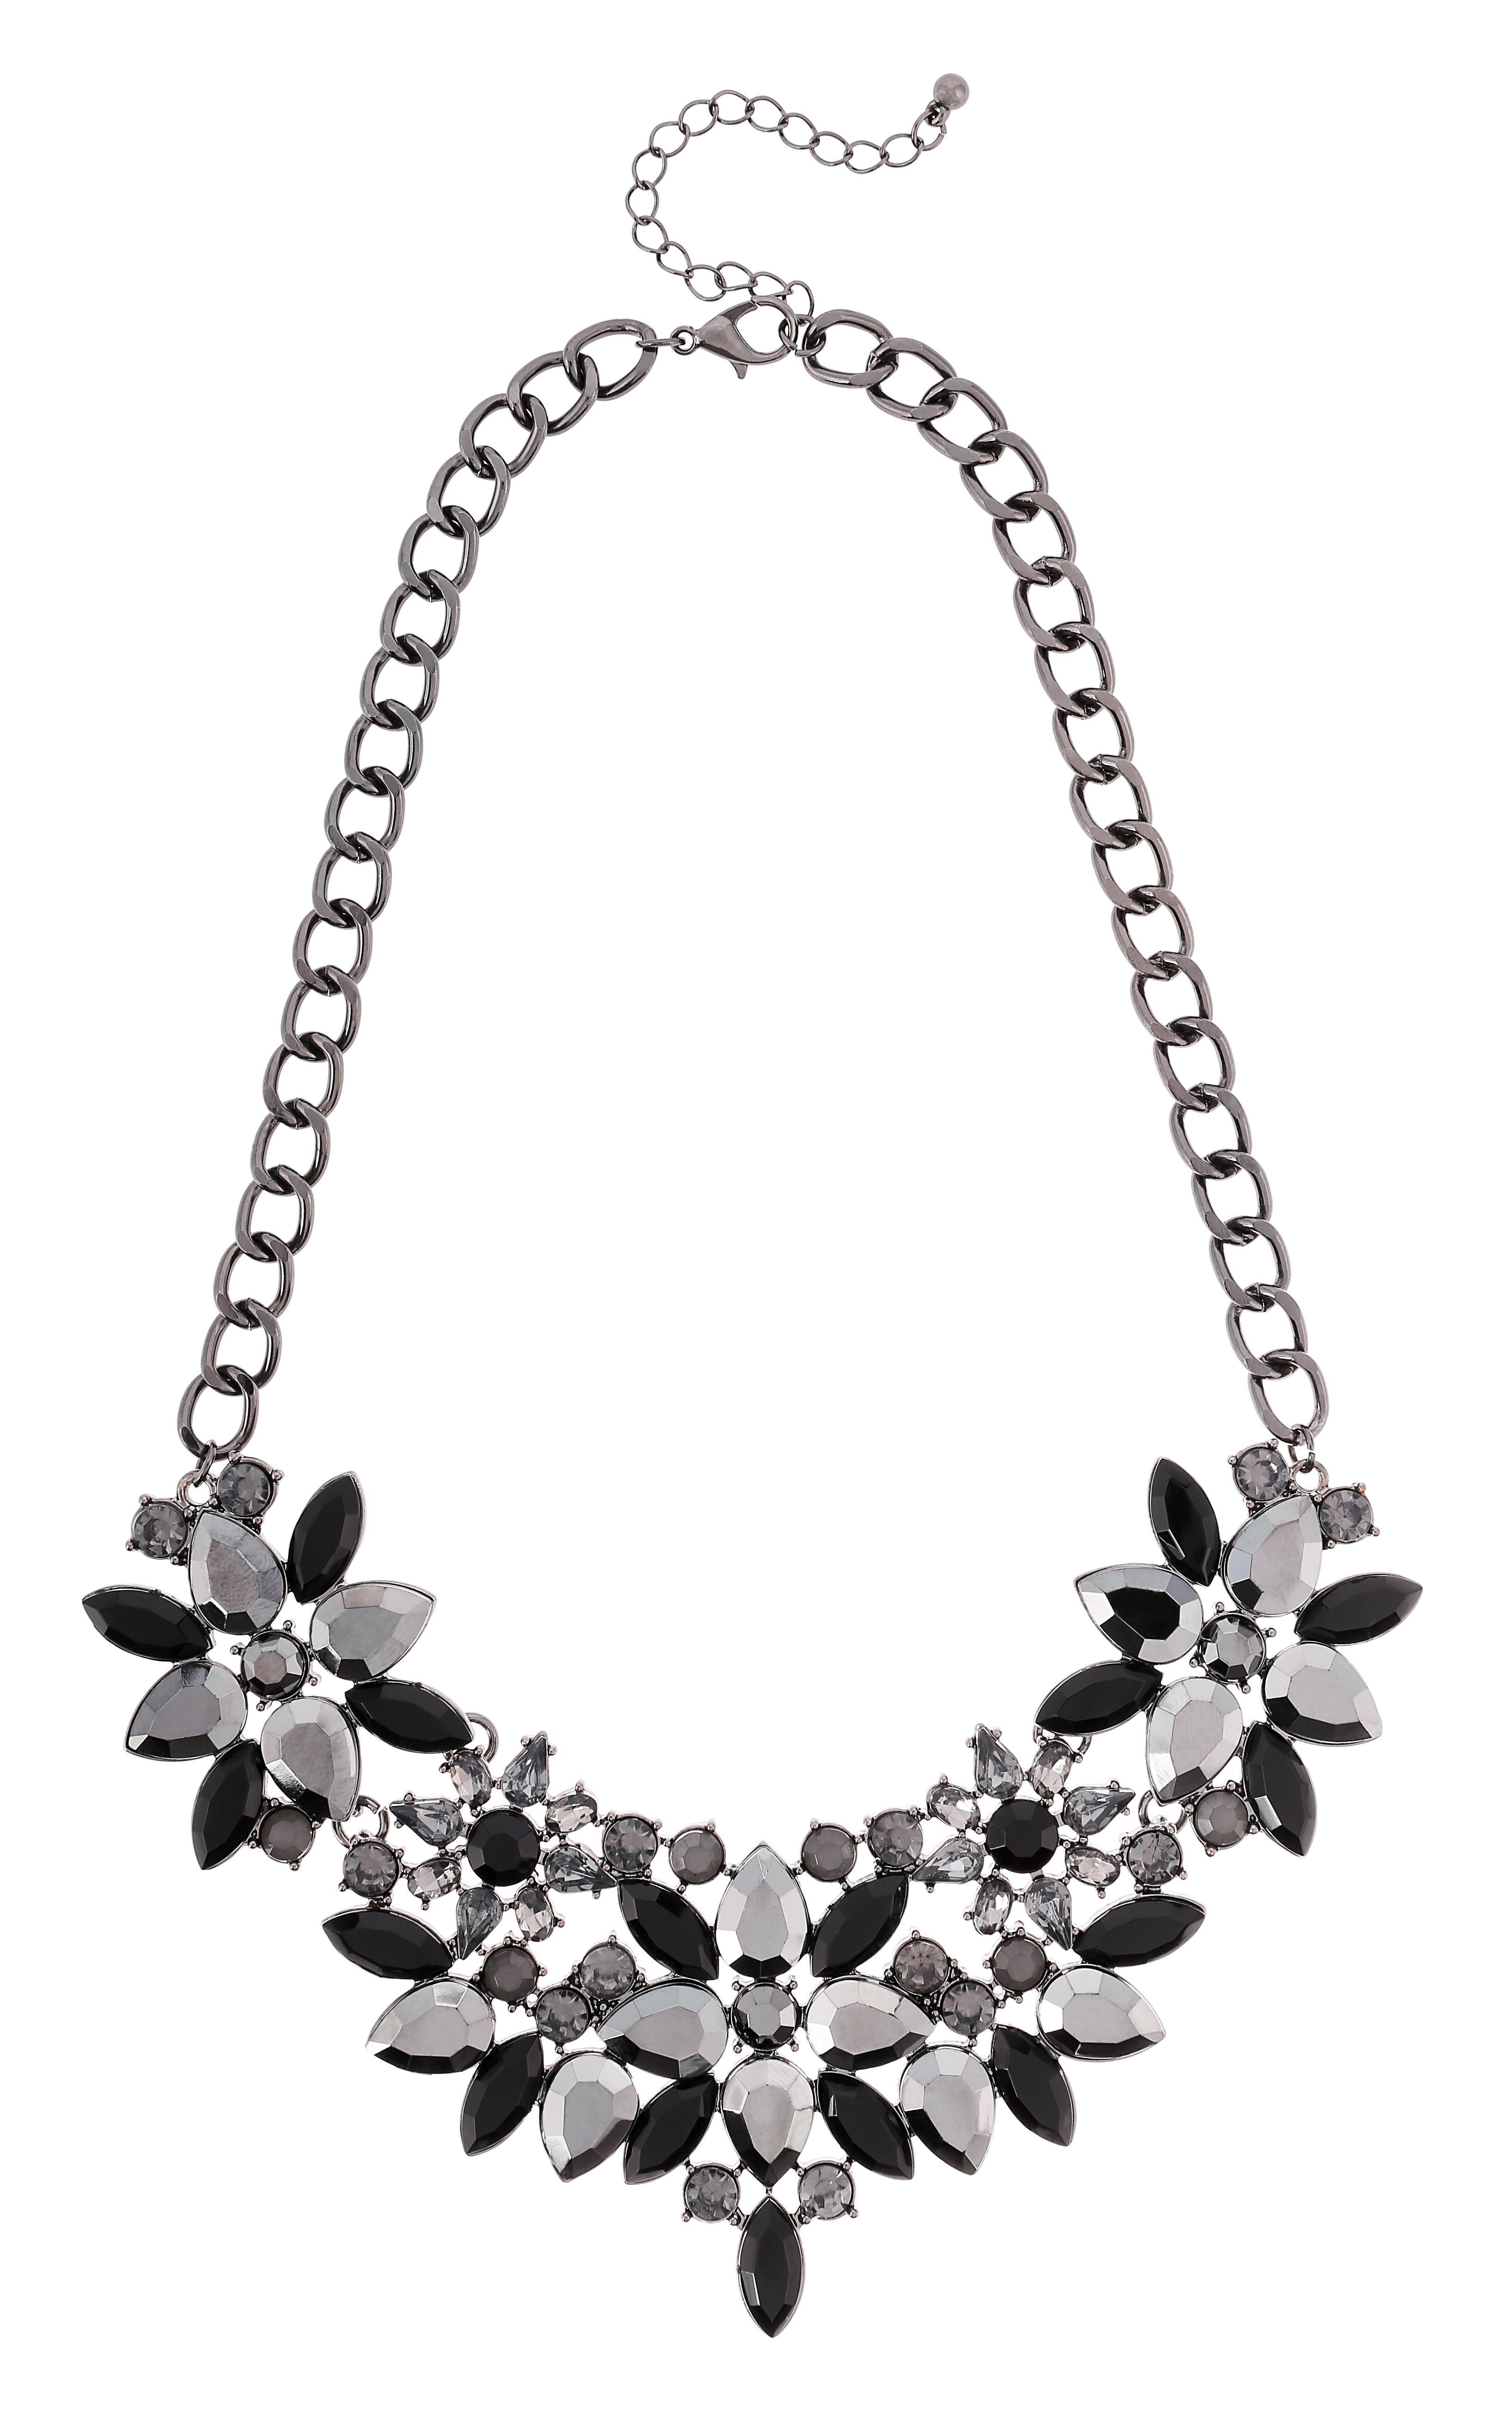 collier anthracite flowers bijou brigitte online shop nl accessoires in 2019 schmuck. Black Bedroom Furniture Sets. Home Design Ideas